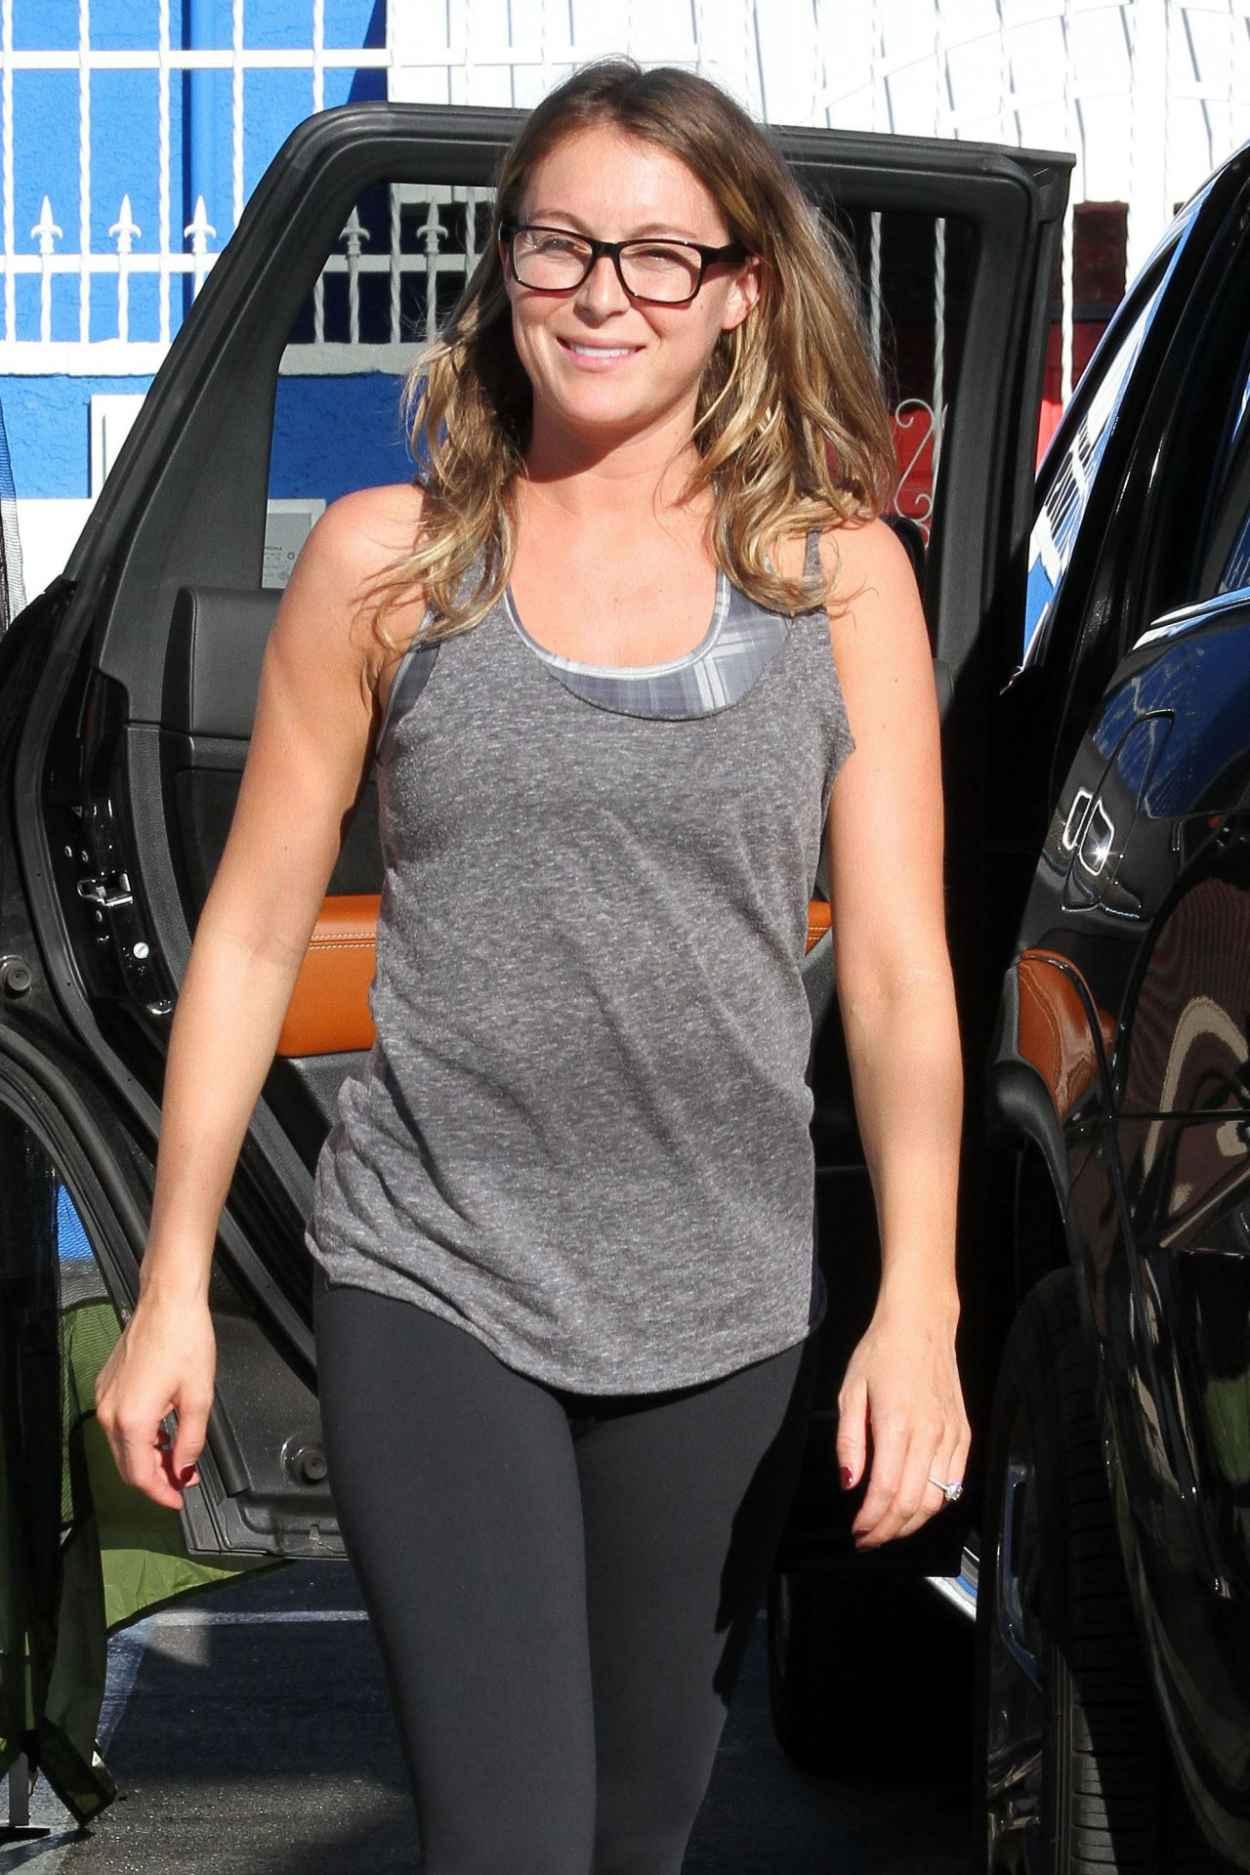 Alexa Pena Vega in Leggings - DWTS Studio in Hollywood, September 2015-2